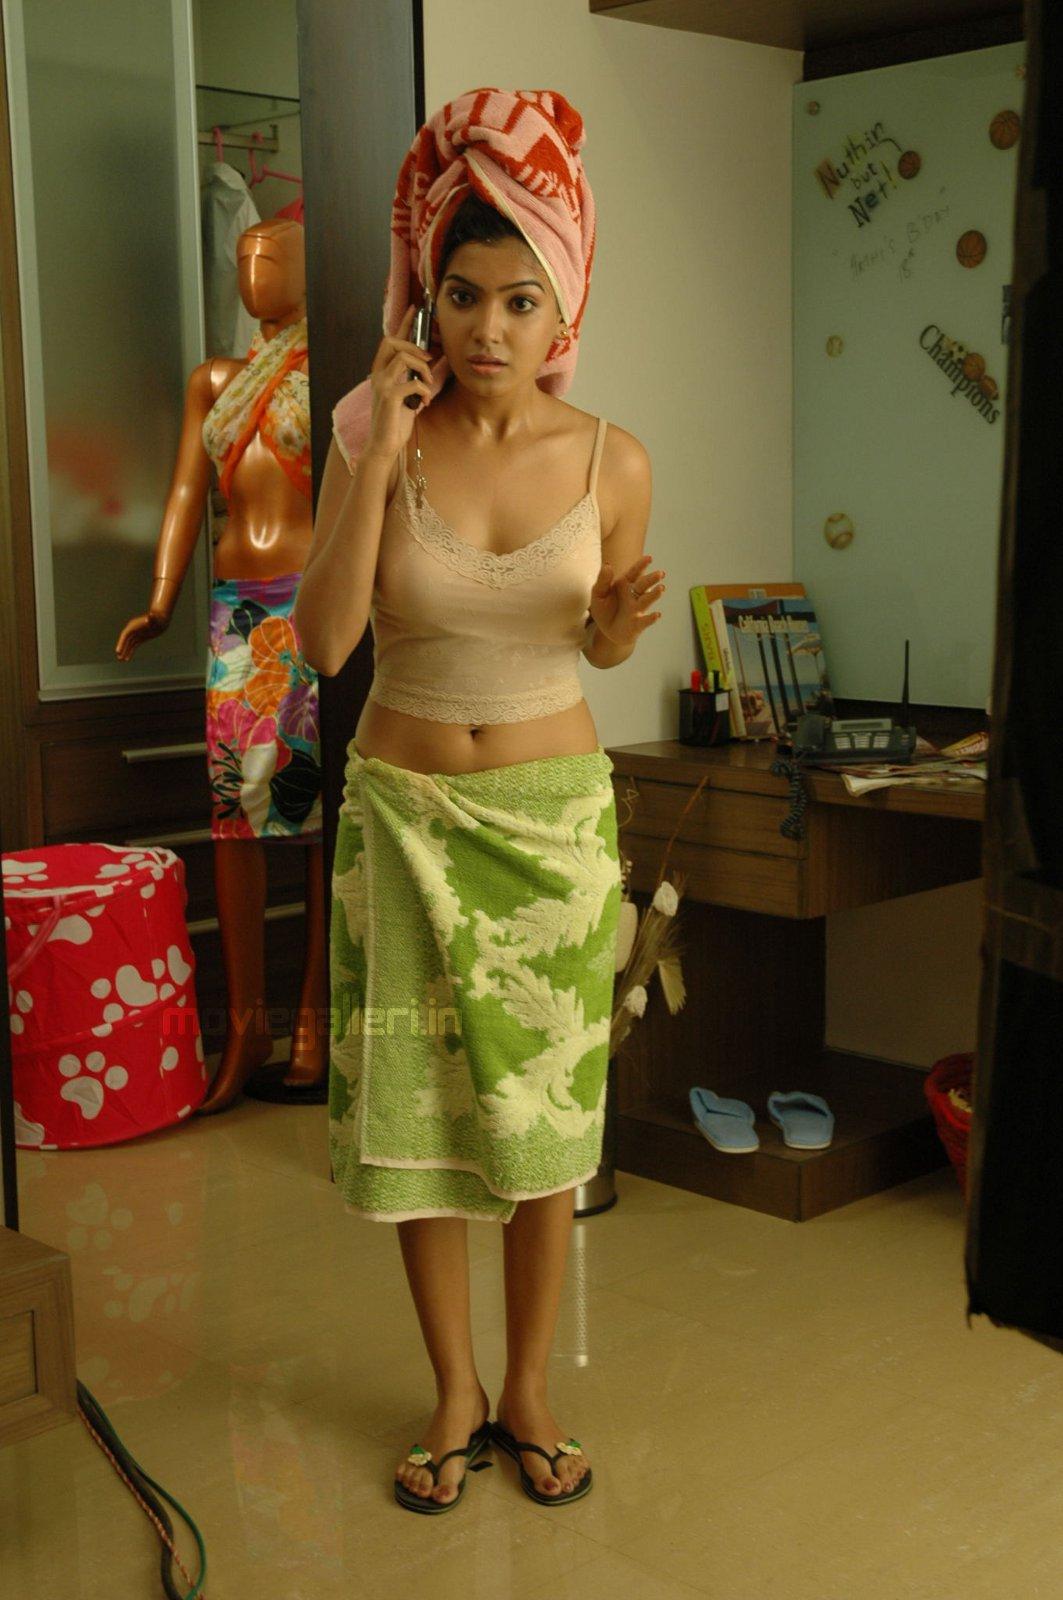 funtrublog: tamil actress samantha hot in bath towel stills